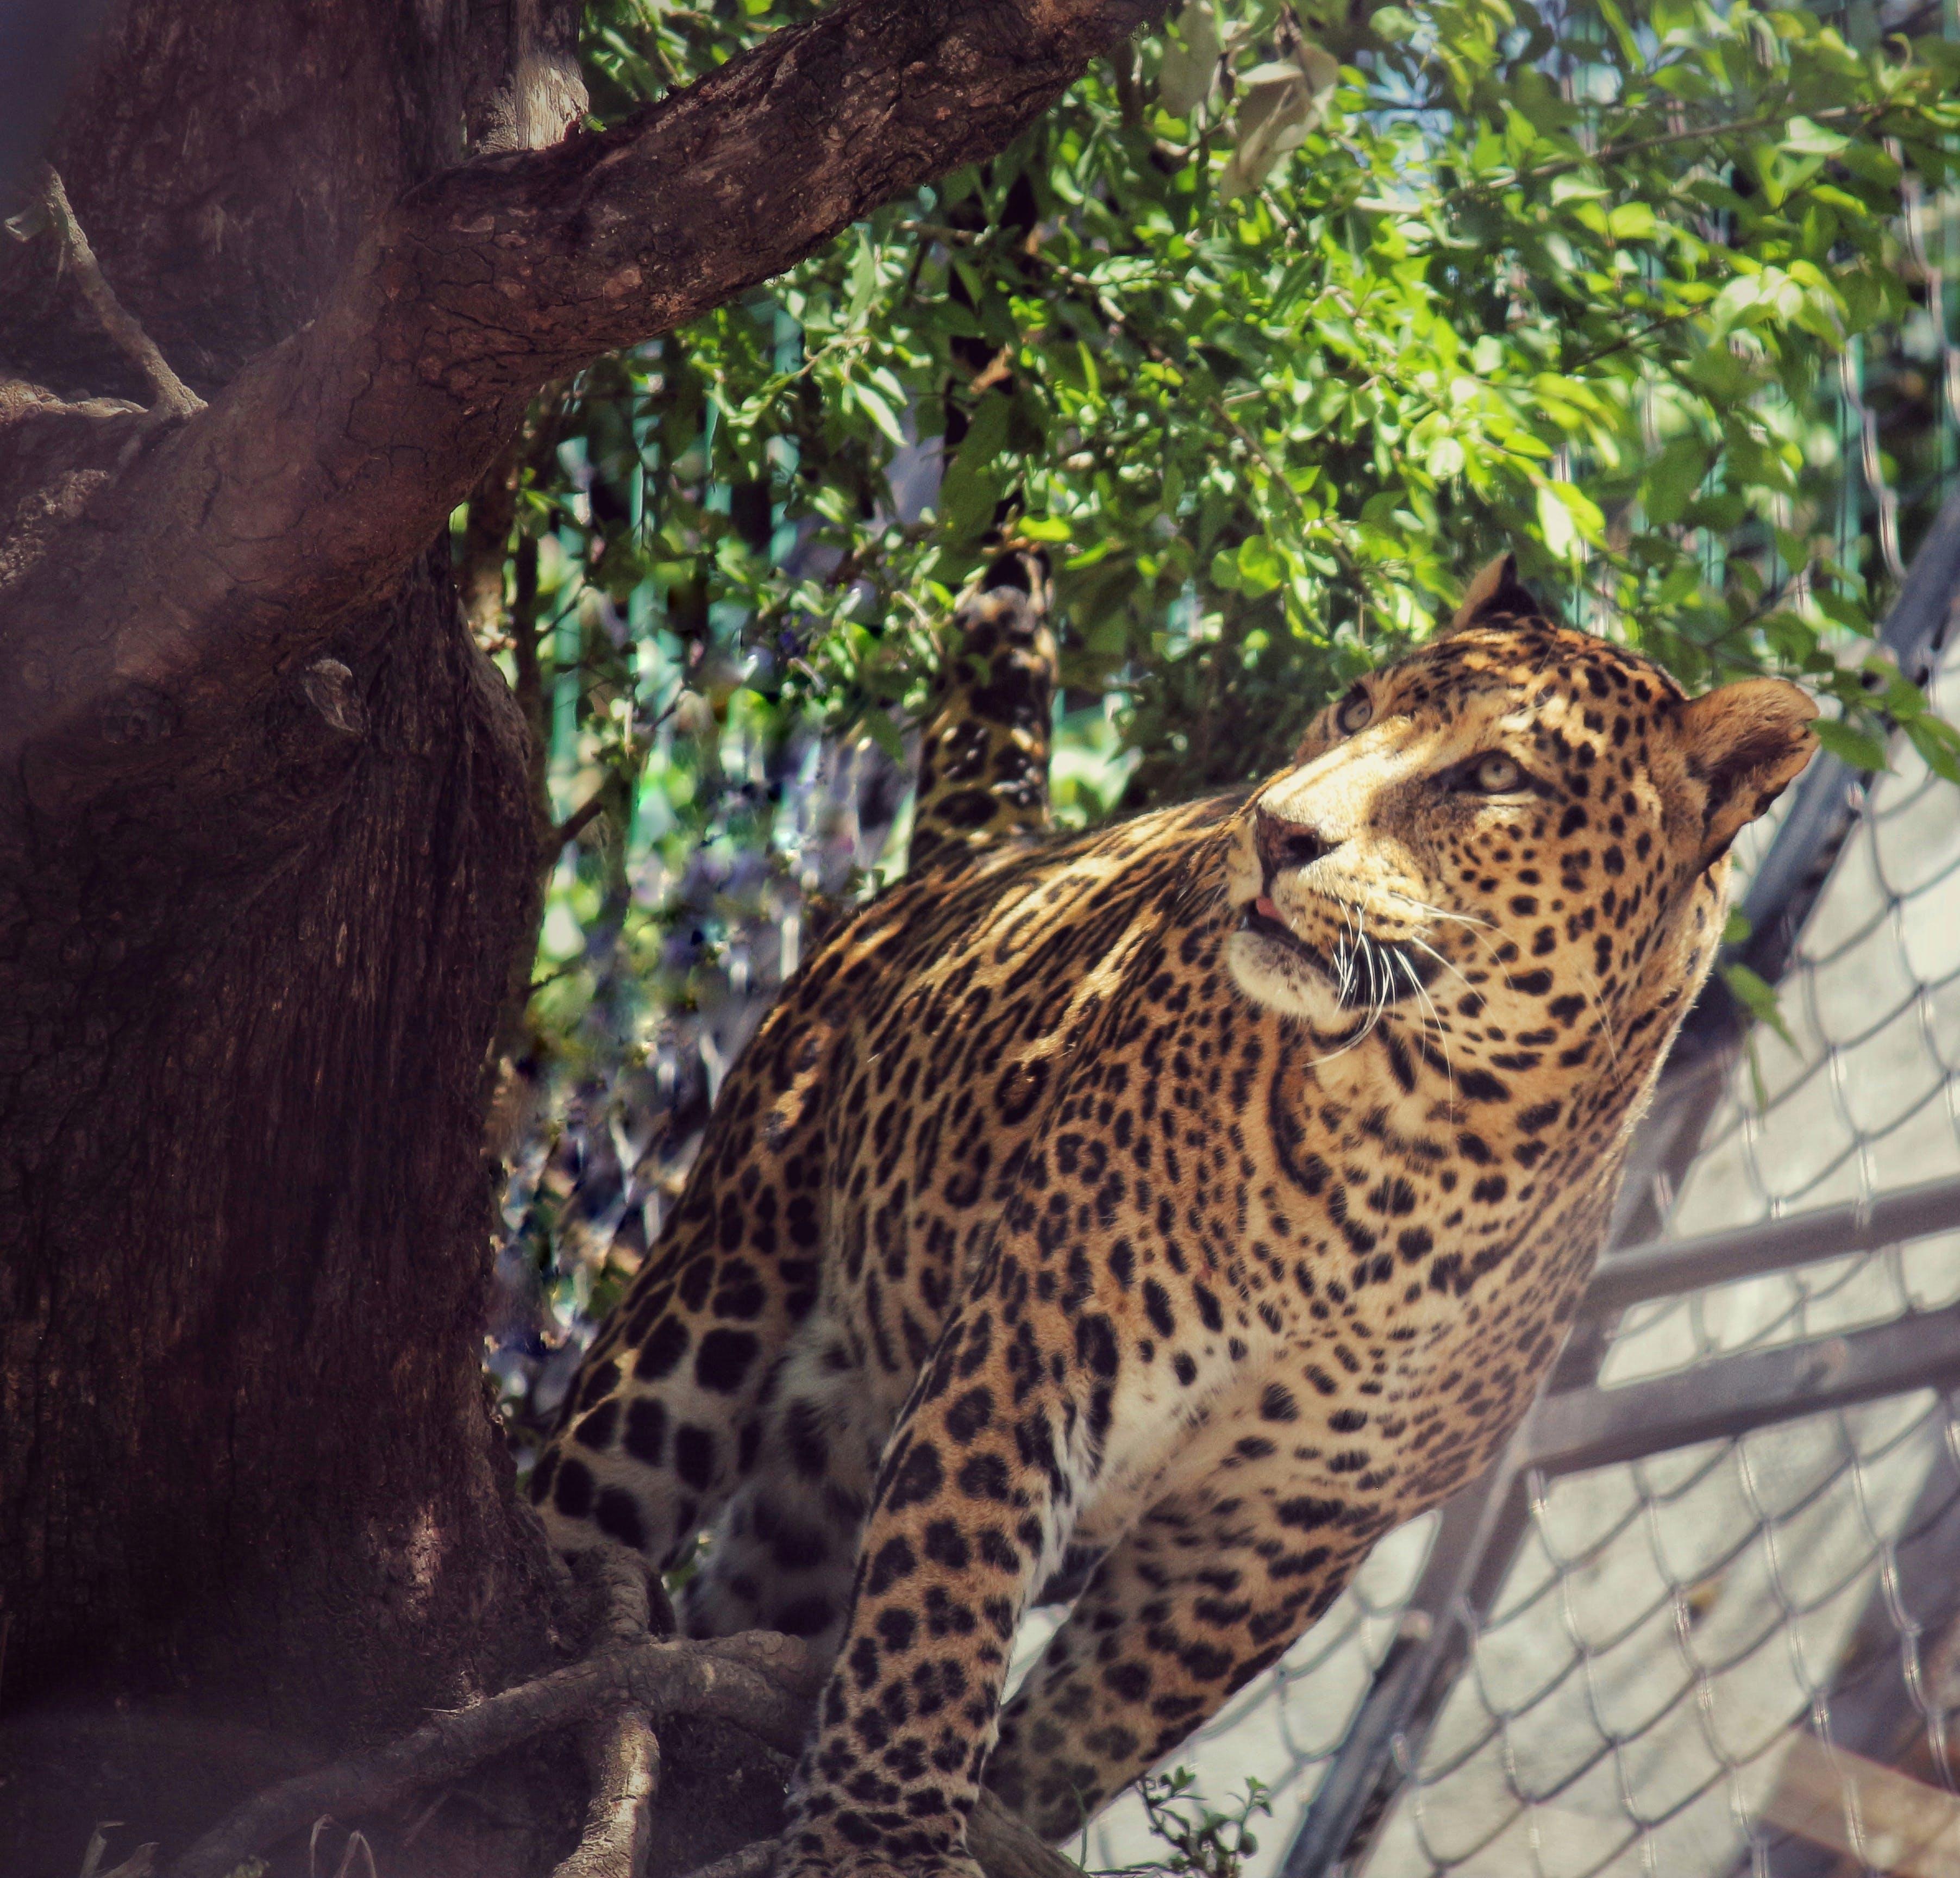 Gratis stockfoto met #animalprints #, #luipaard, #wildlifecrime #india #nainitalzoo #leopardlife